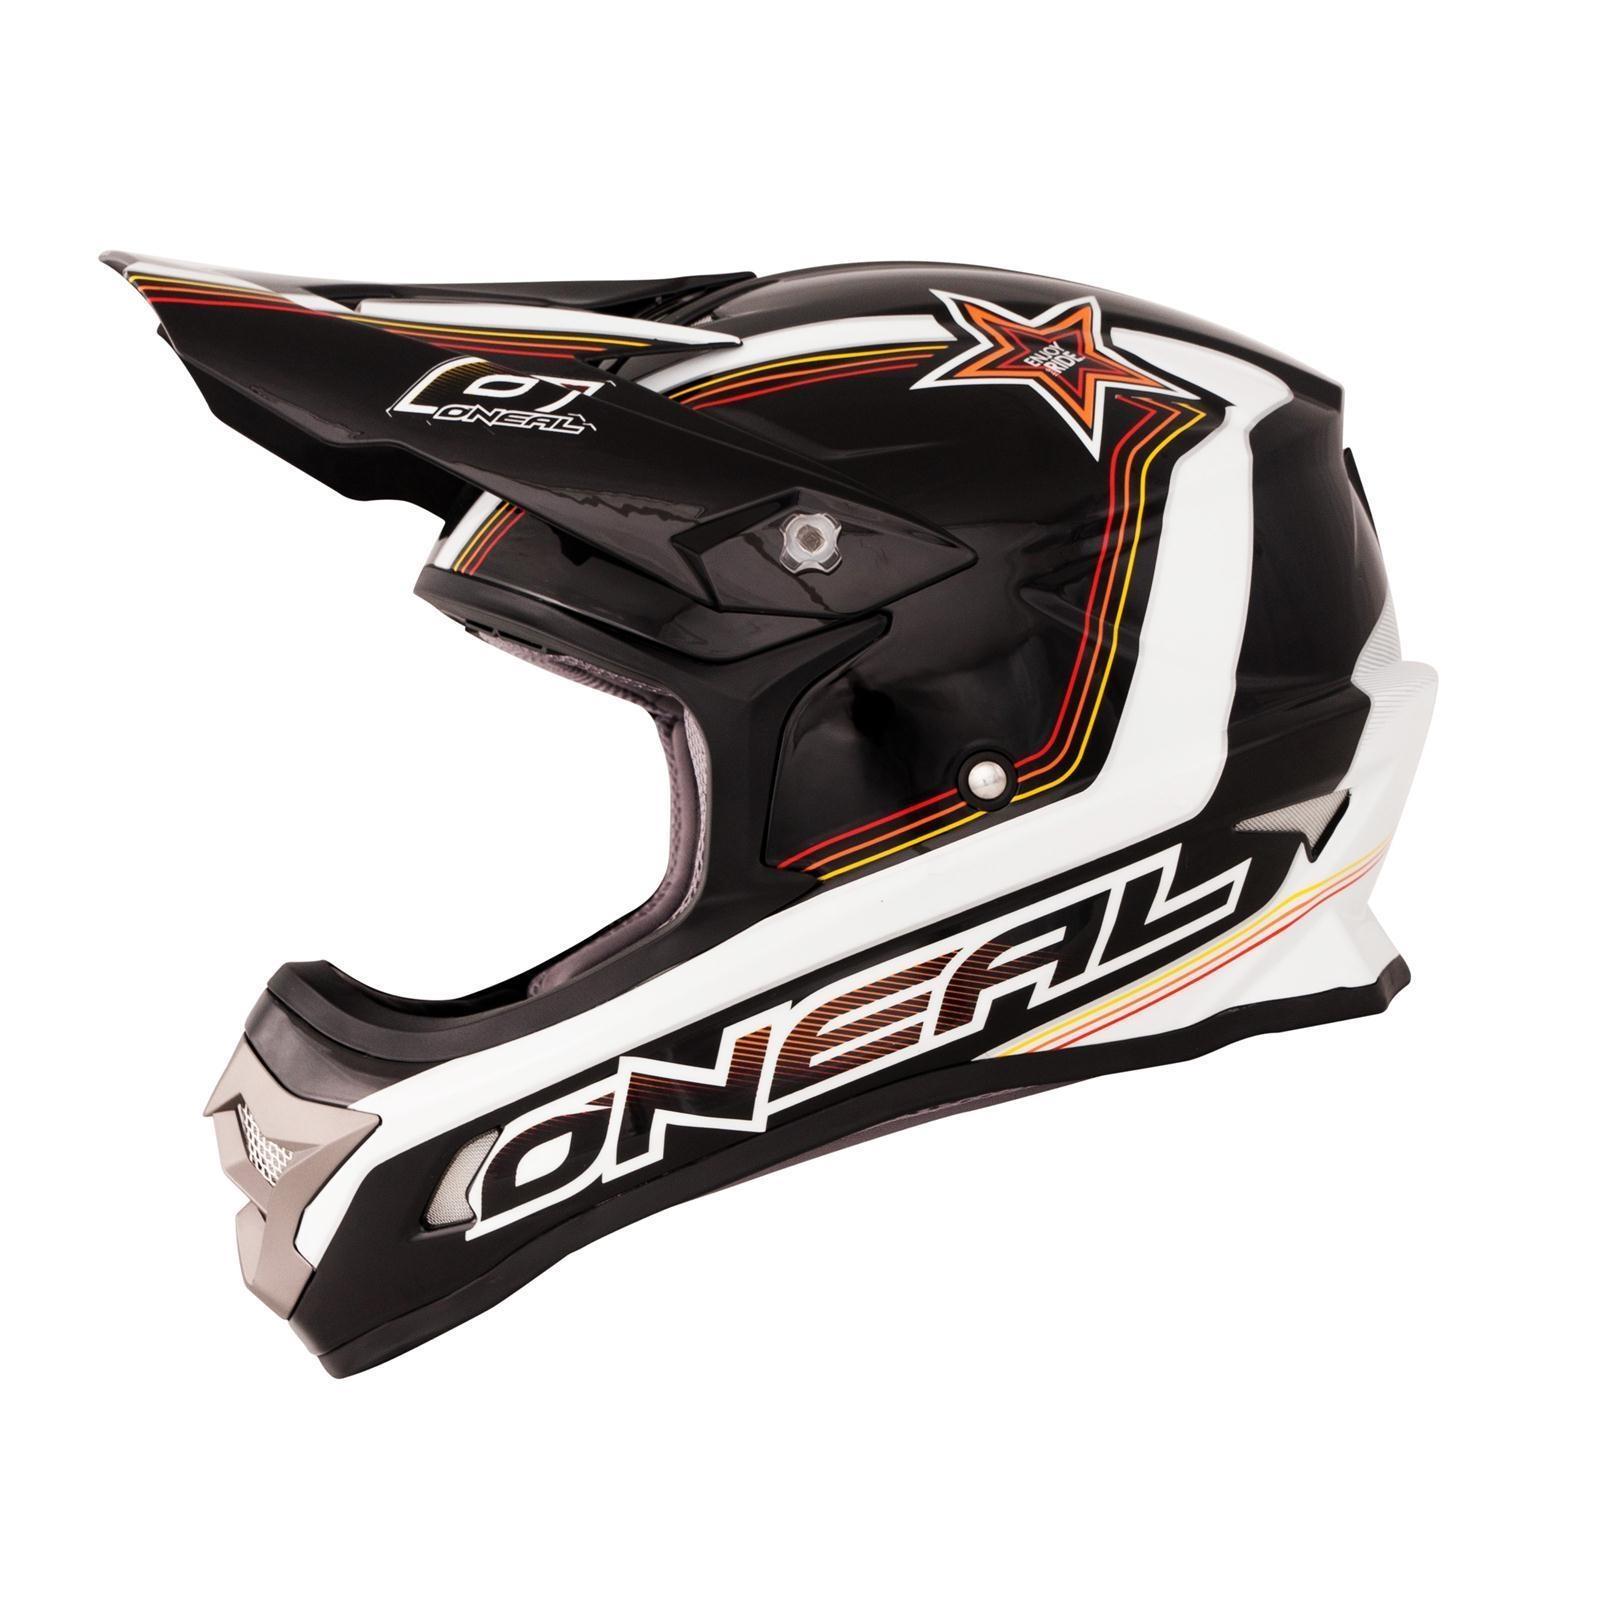 ONeal-Motocross-casco-MX-ENDURO-MOTO-BICI-FUORISTRADA-CROSS-Series-Adventure miniatura 122